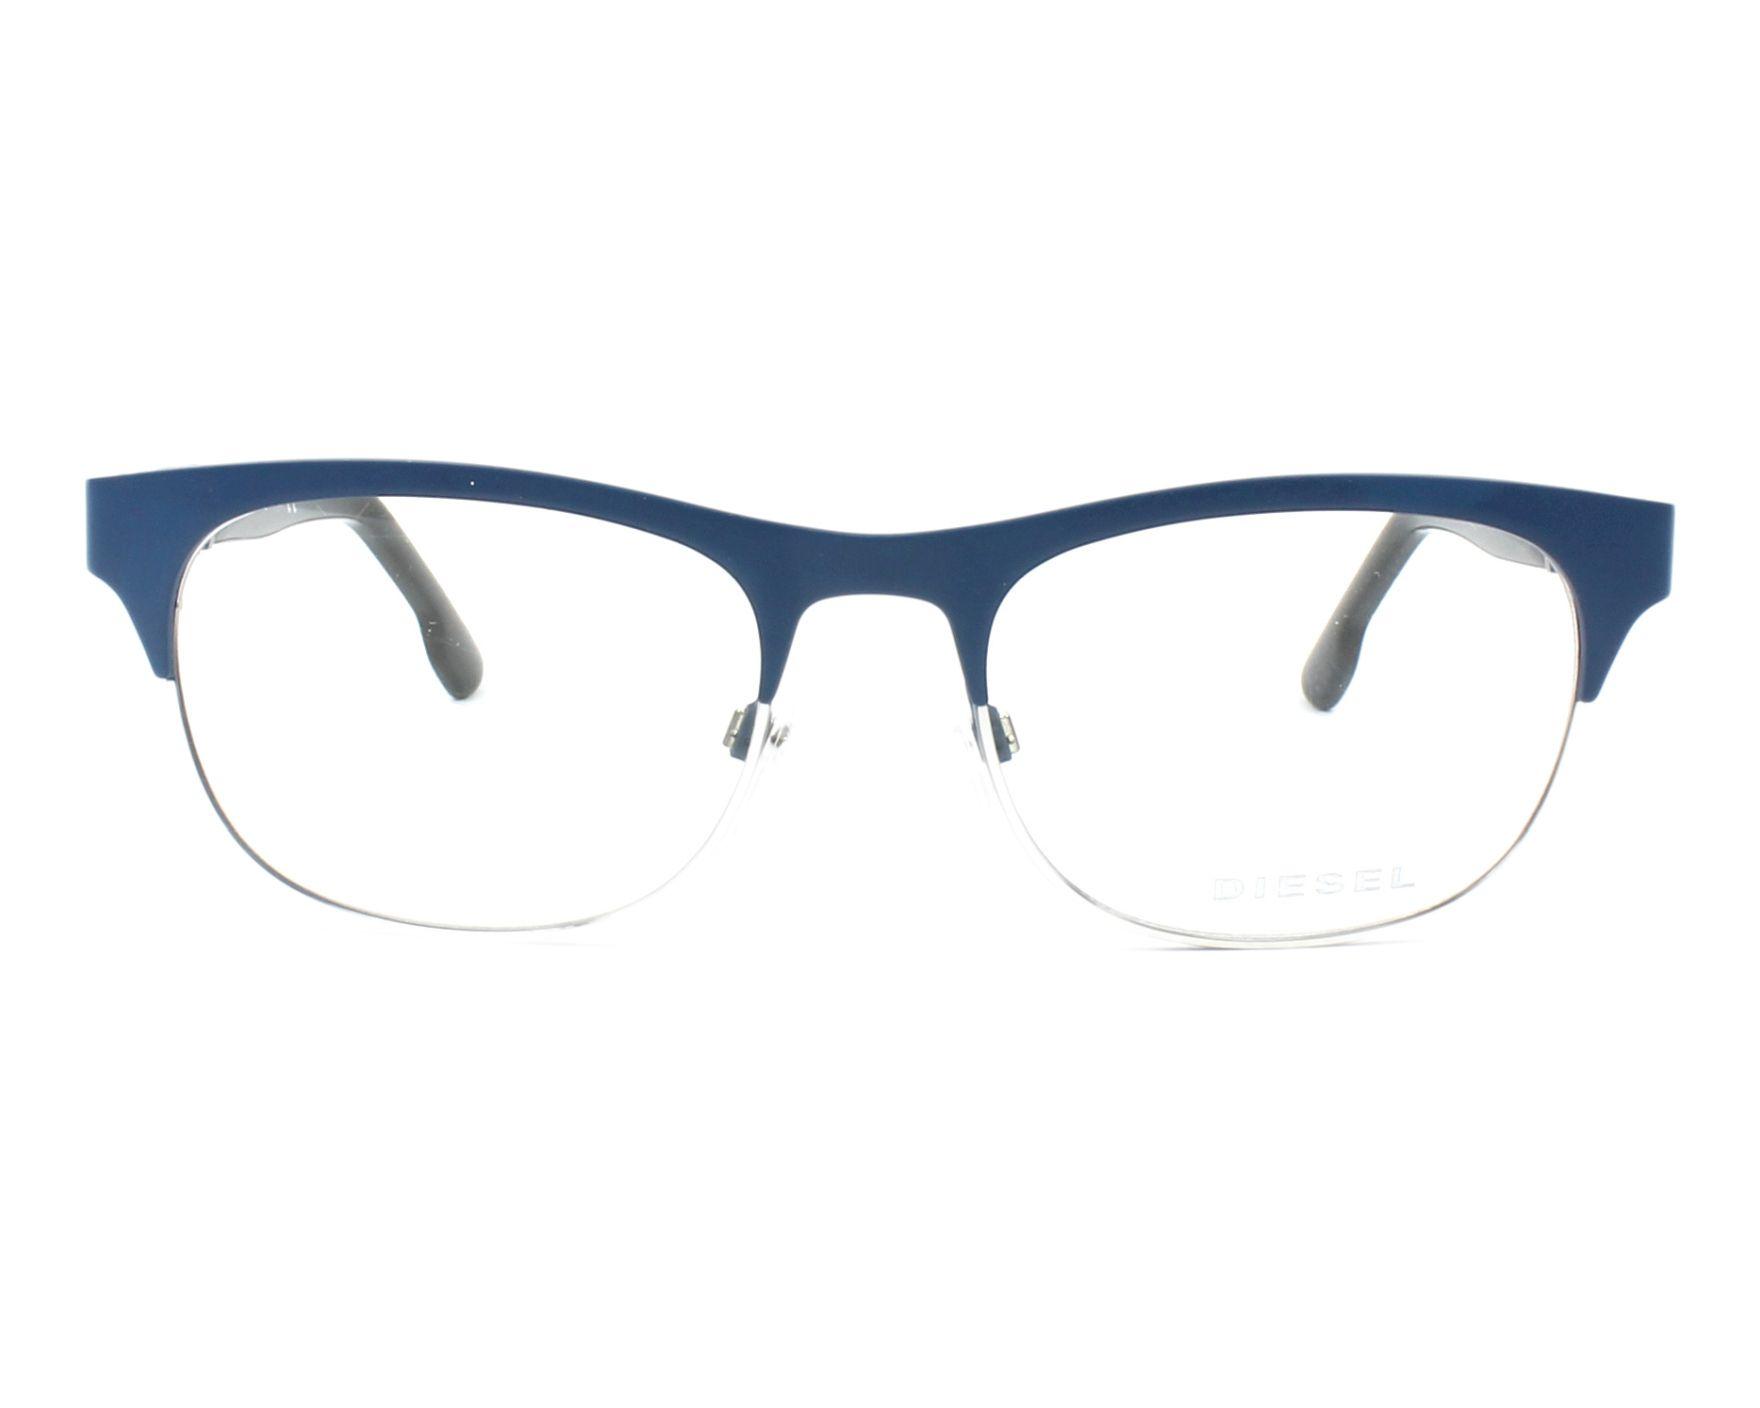 bad9f4efb5 eyeglasses Diesel DL-5125 091 52-17 Blue Blue denim profile view